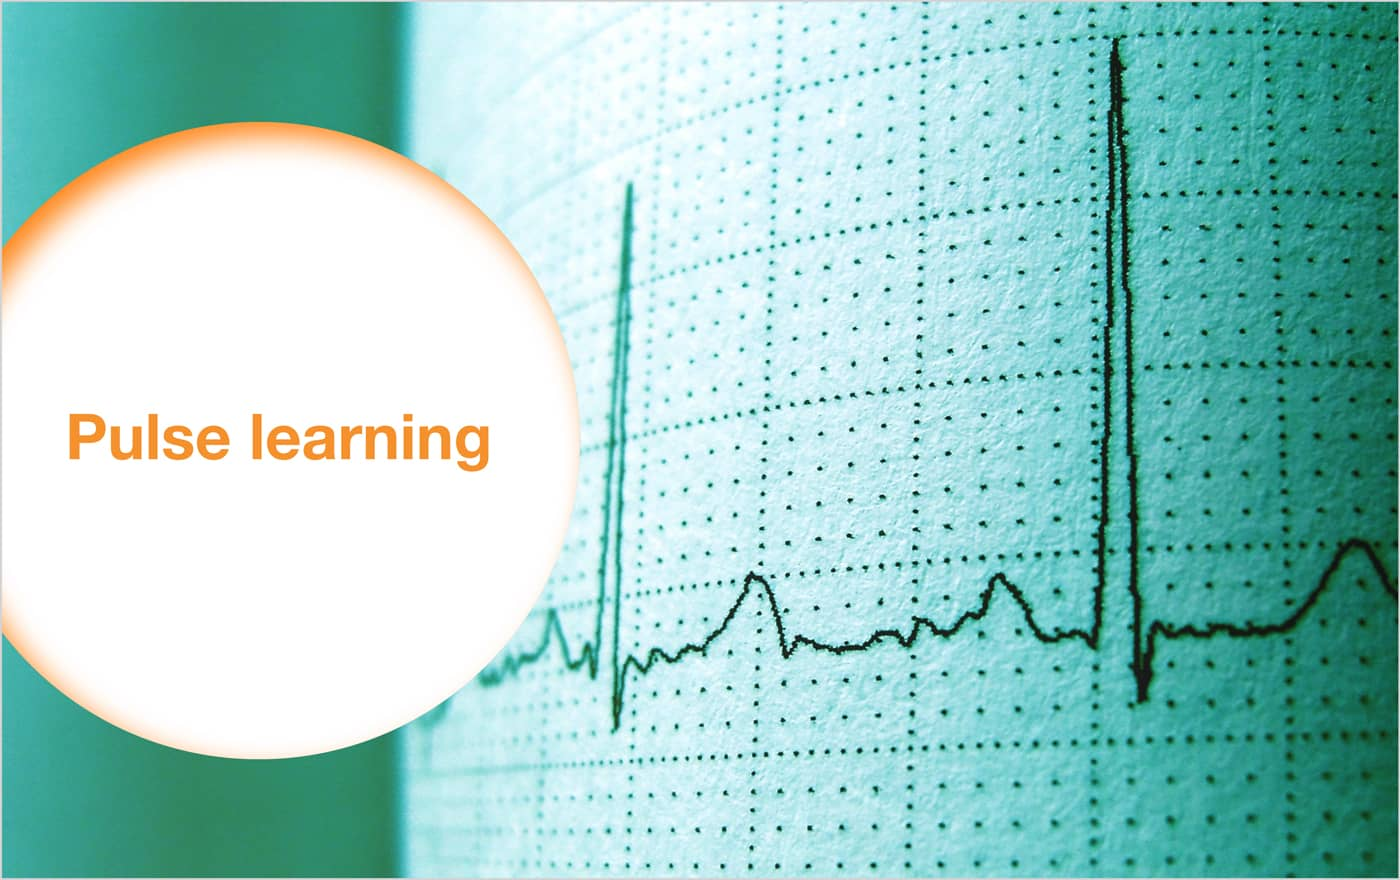 pe-banner-novinky-pulse-learning-700x440@2x-c